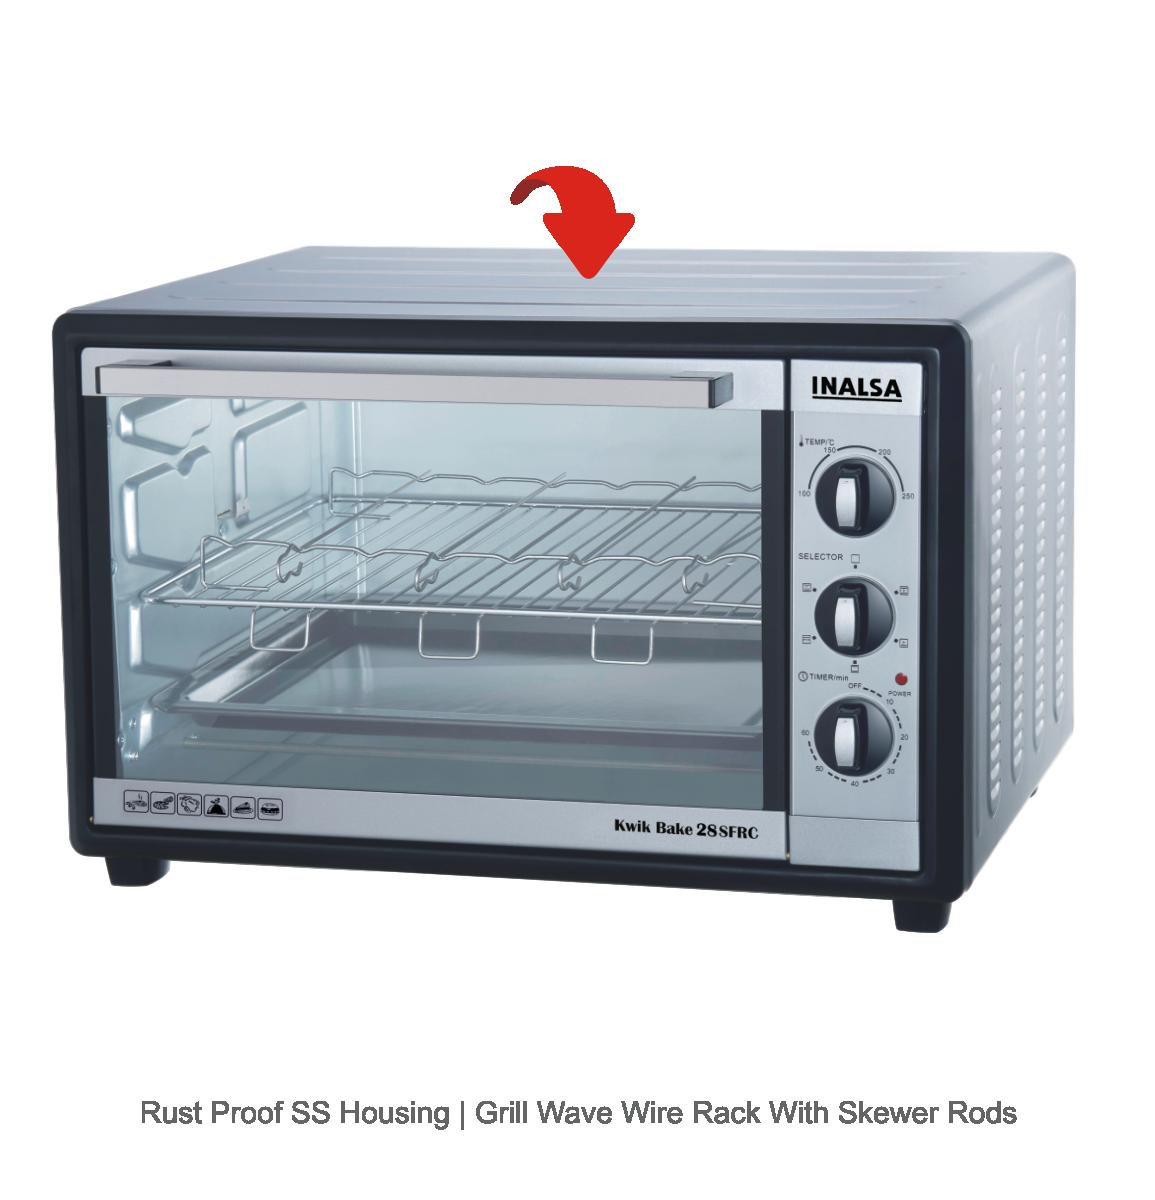 Purifier kart-Home appliance RO Aquafresh water purifier repair and ...